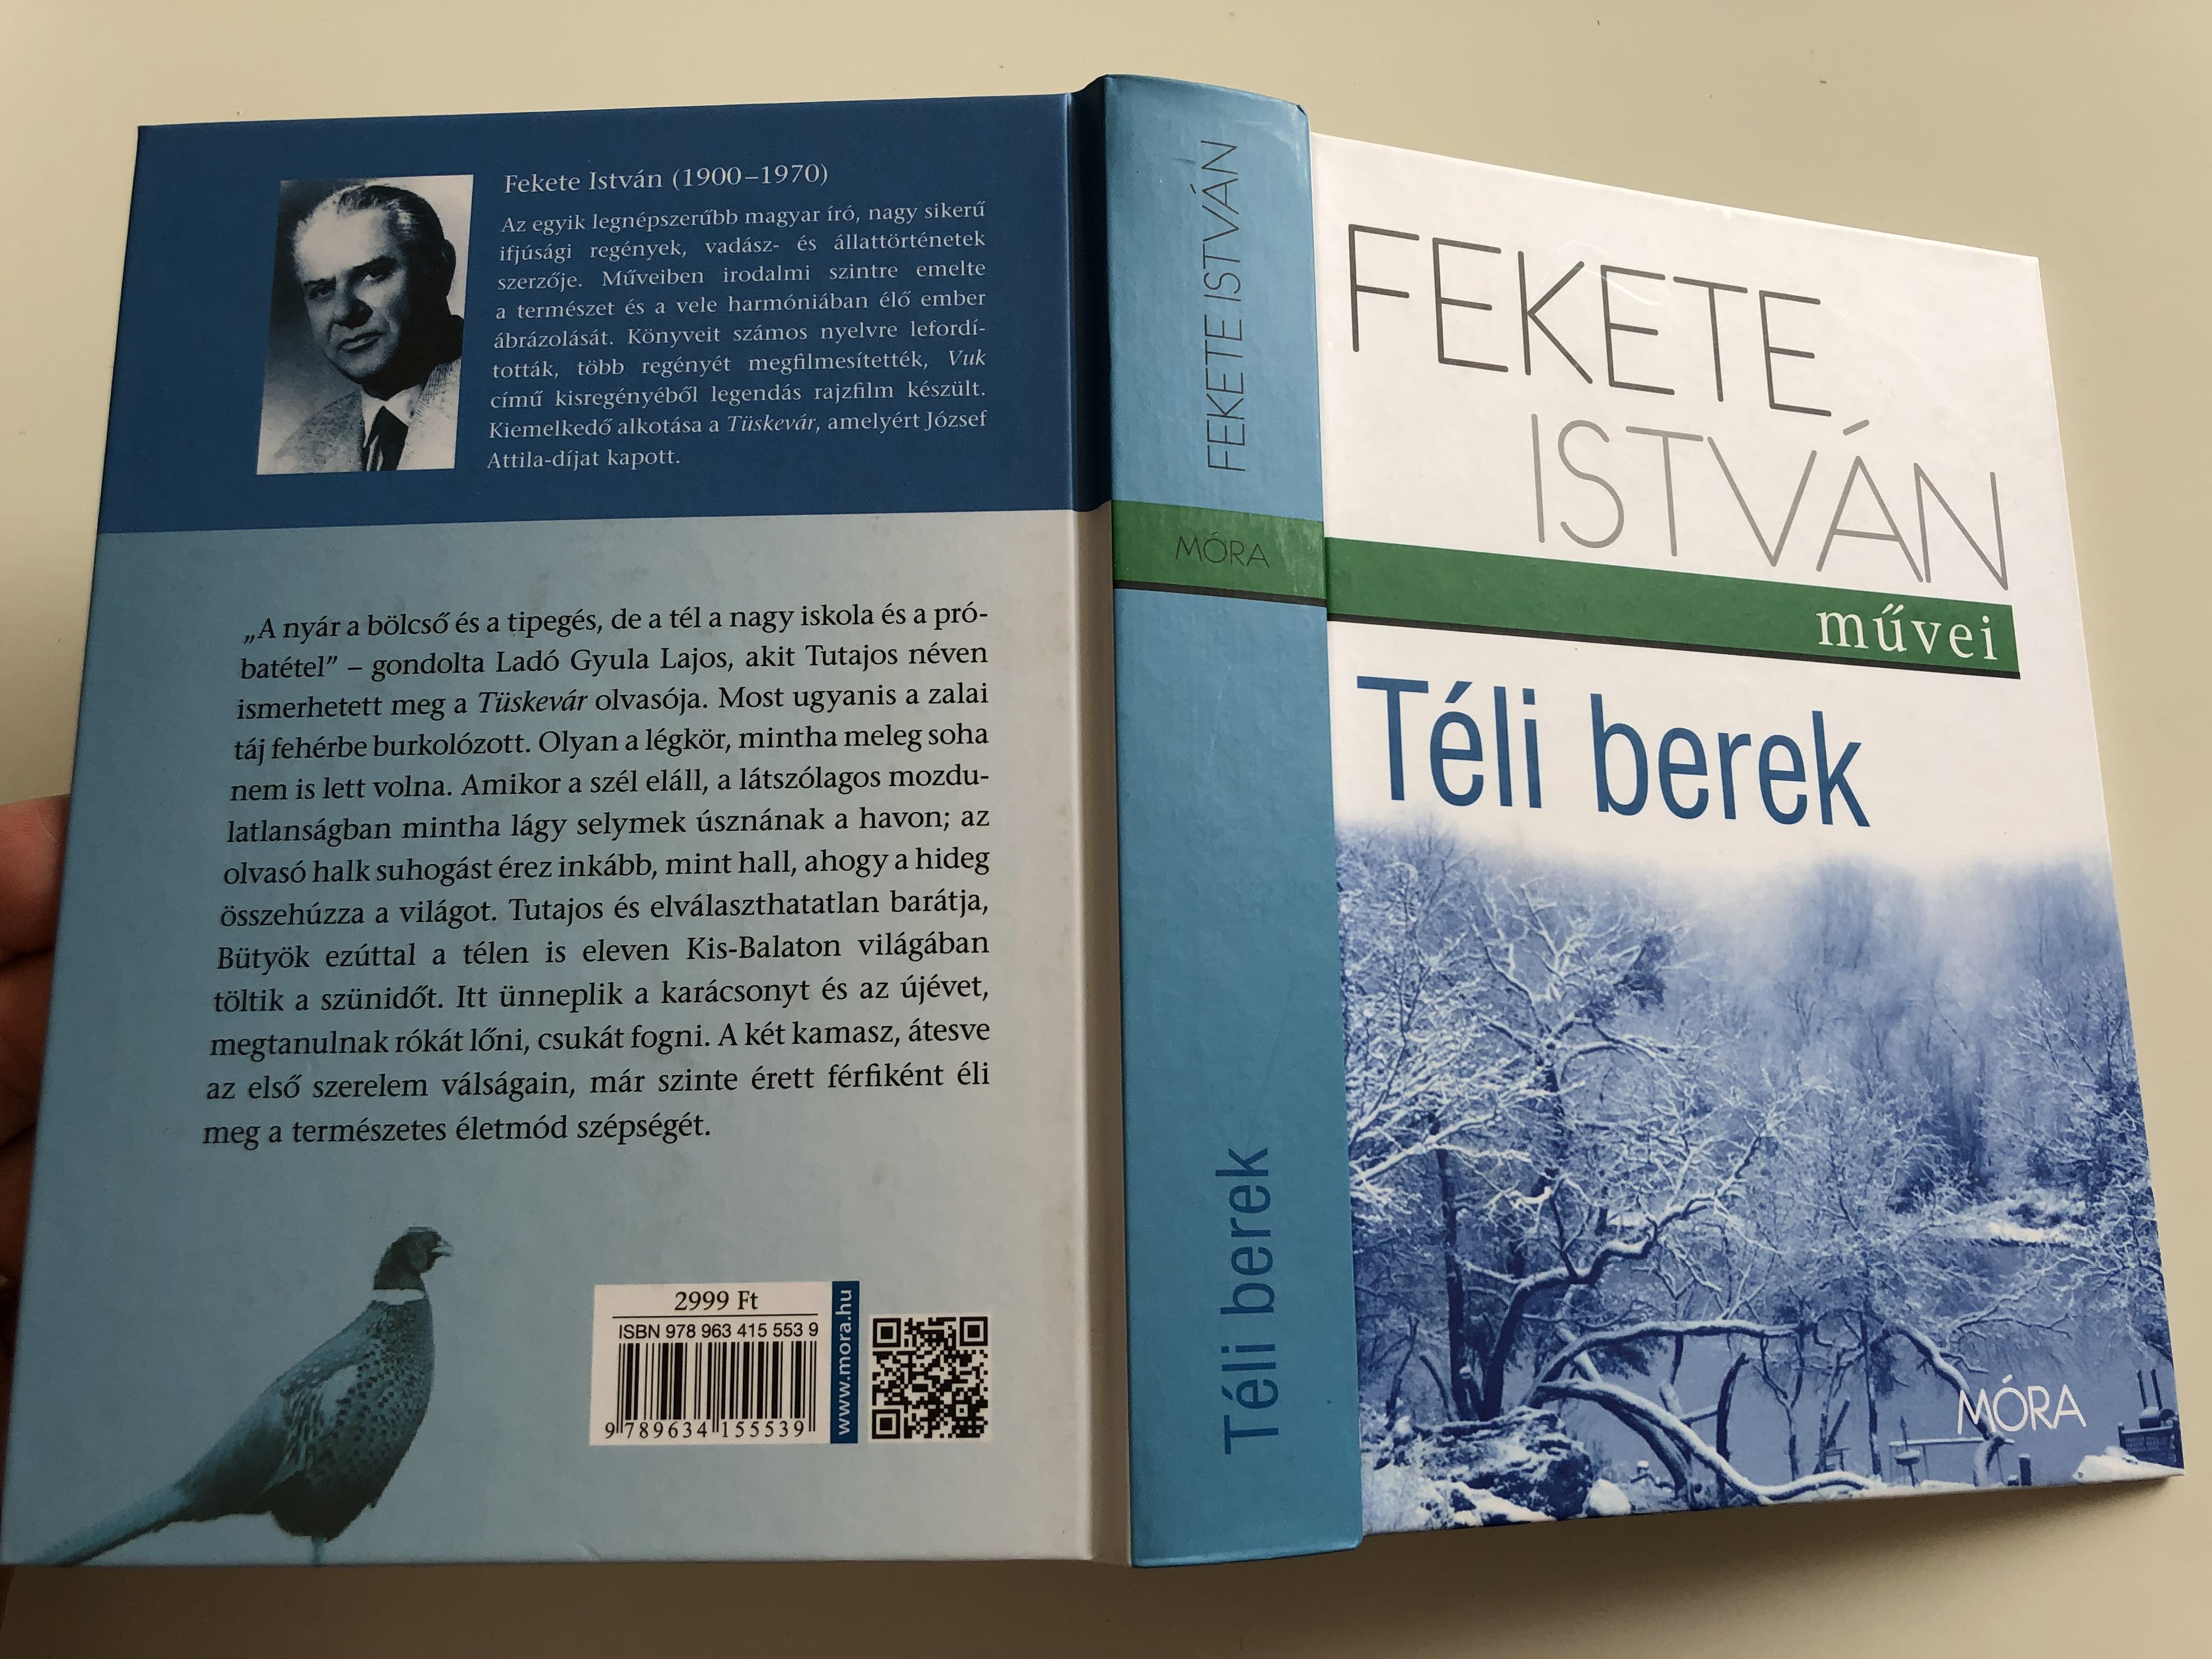 t-li-berek-by-fekete-istv-n-m-ra-k-nyvkiad-2016-hardcover-hungarian-youth-novel-13-.jpg